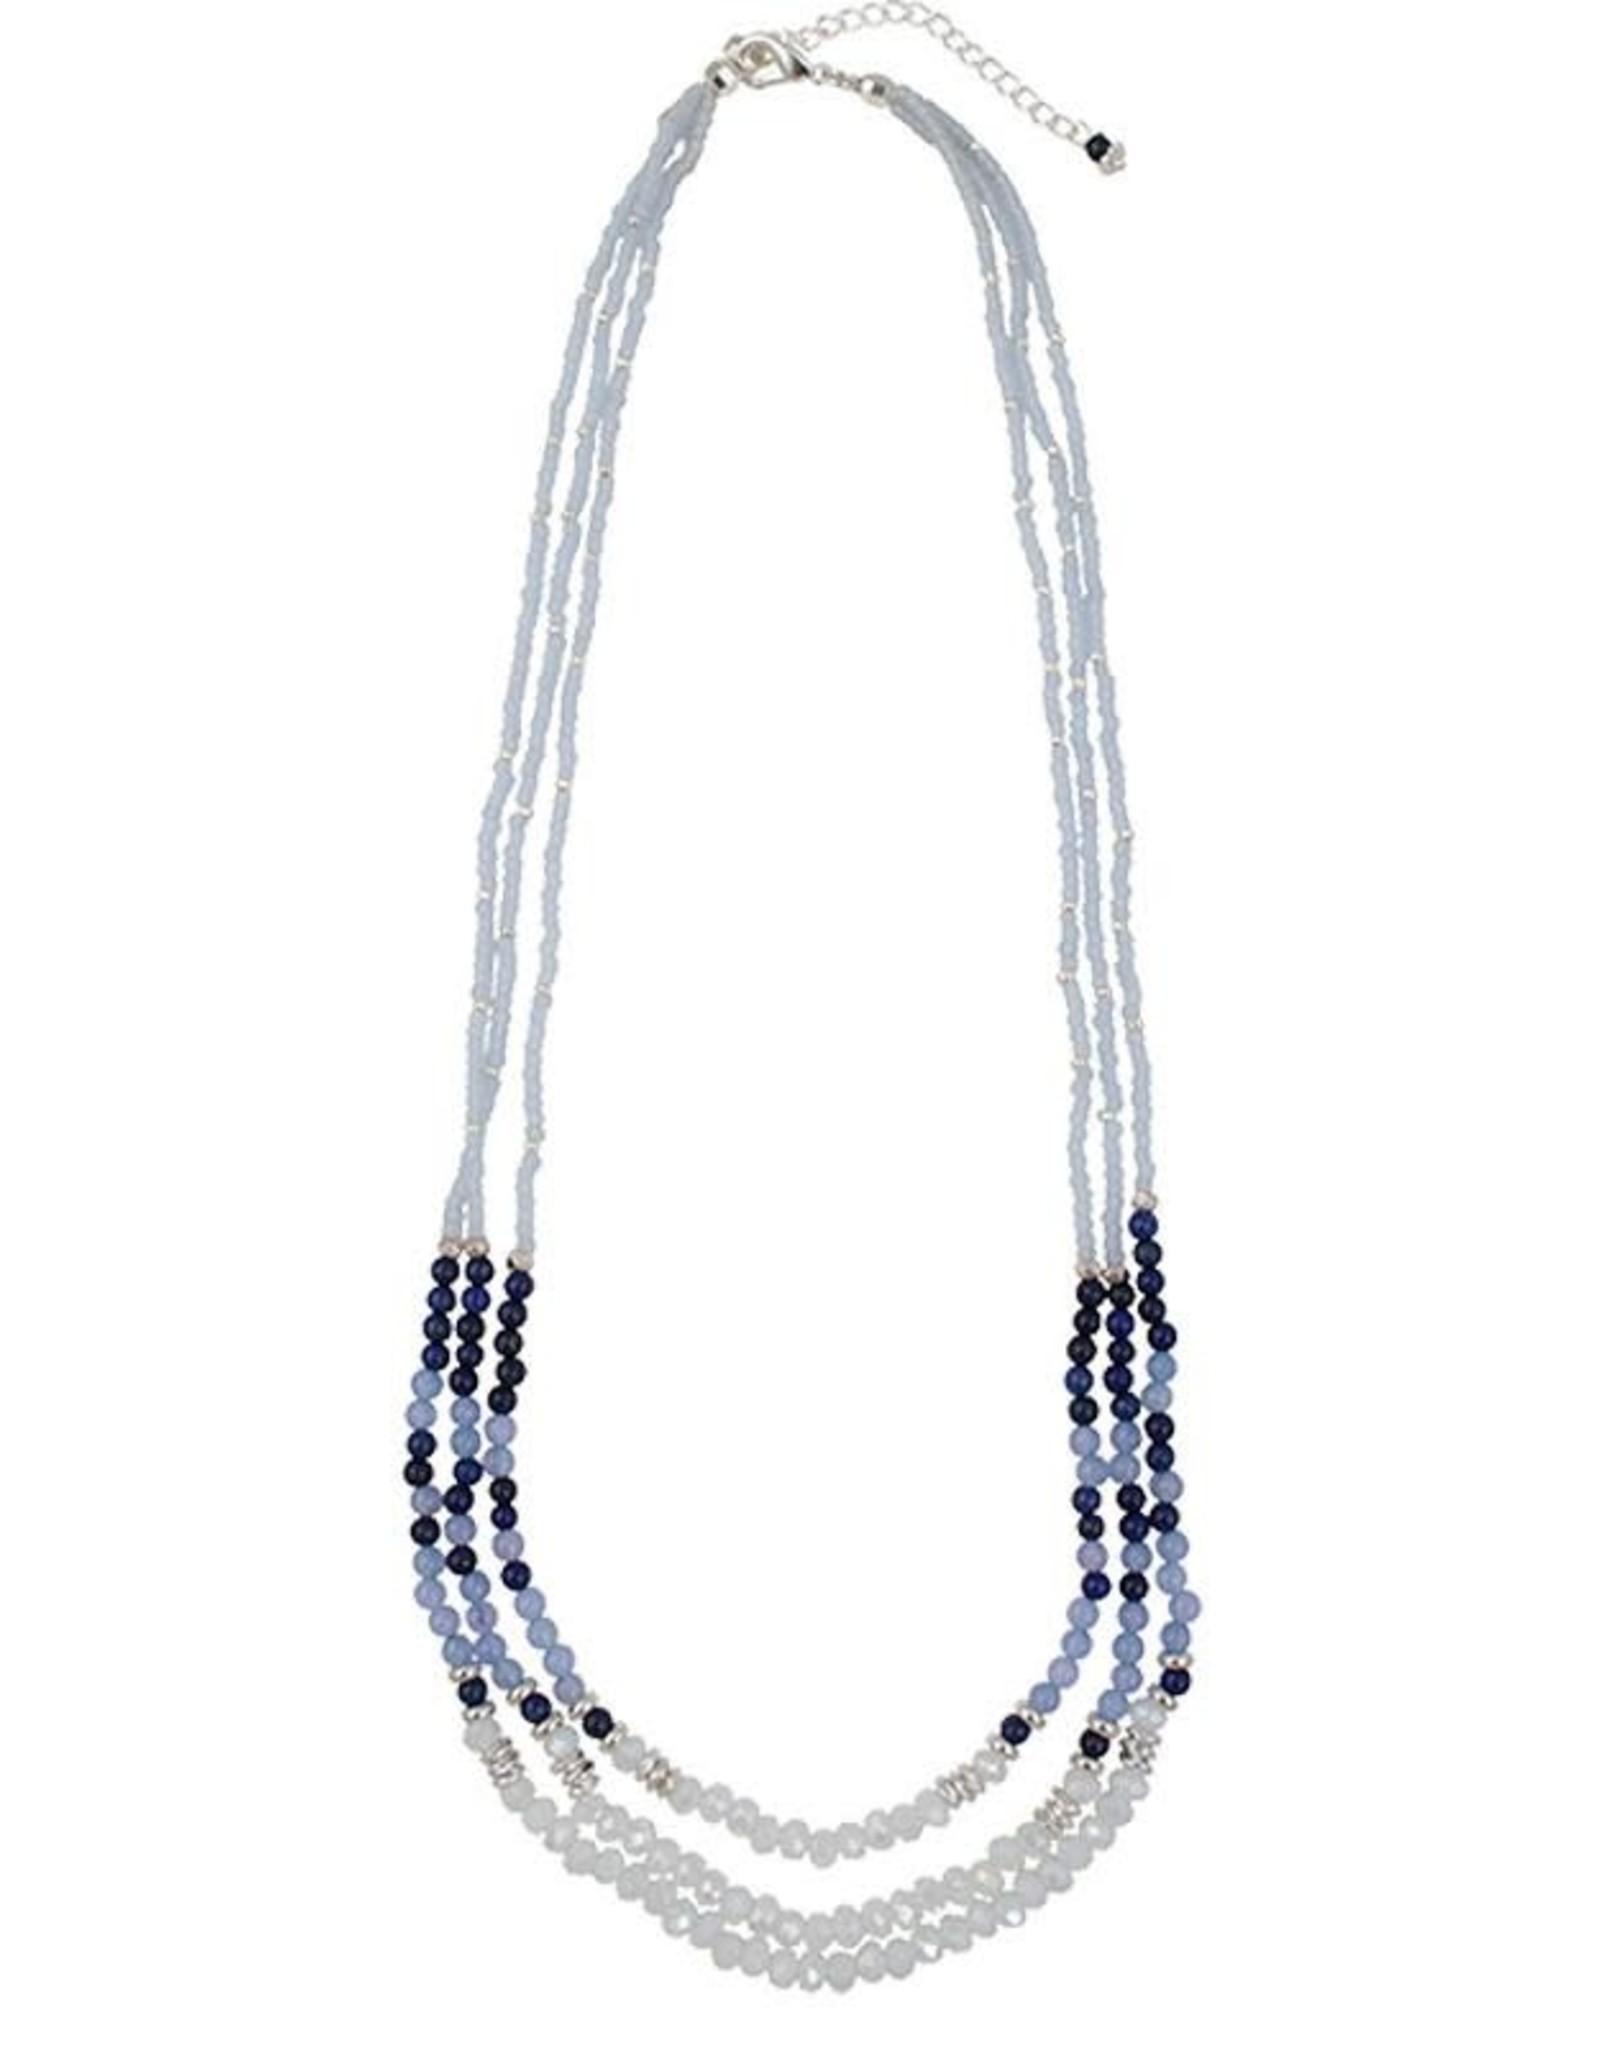 Maia Necklace, Blue